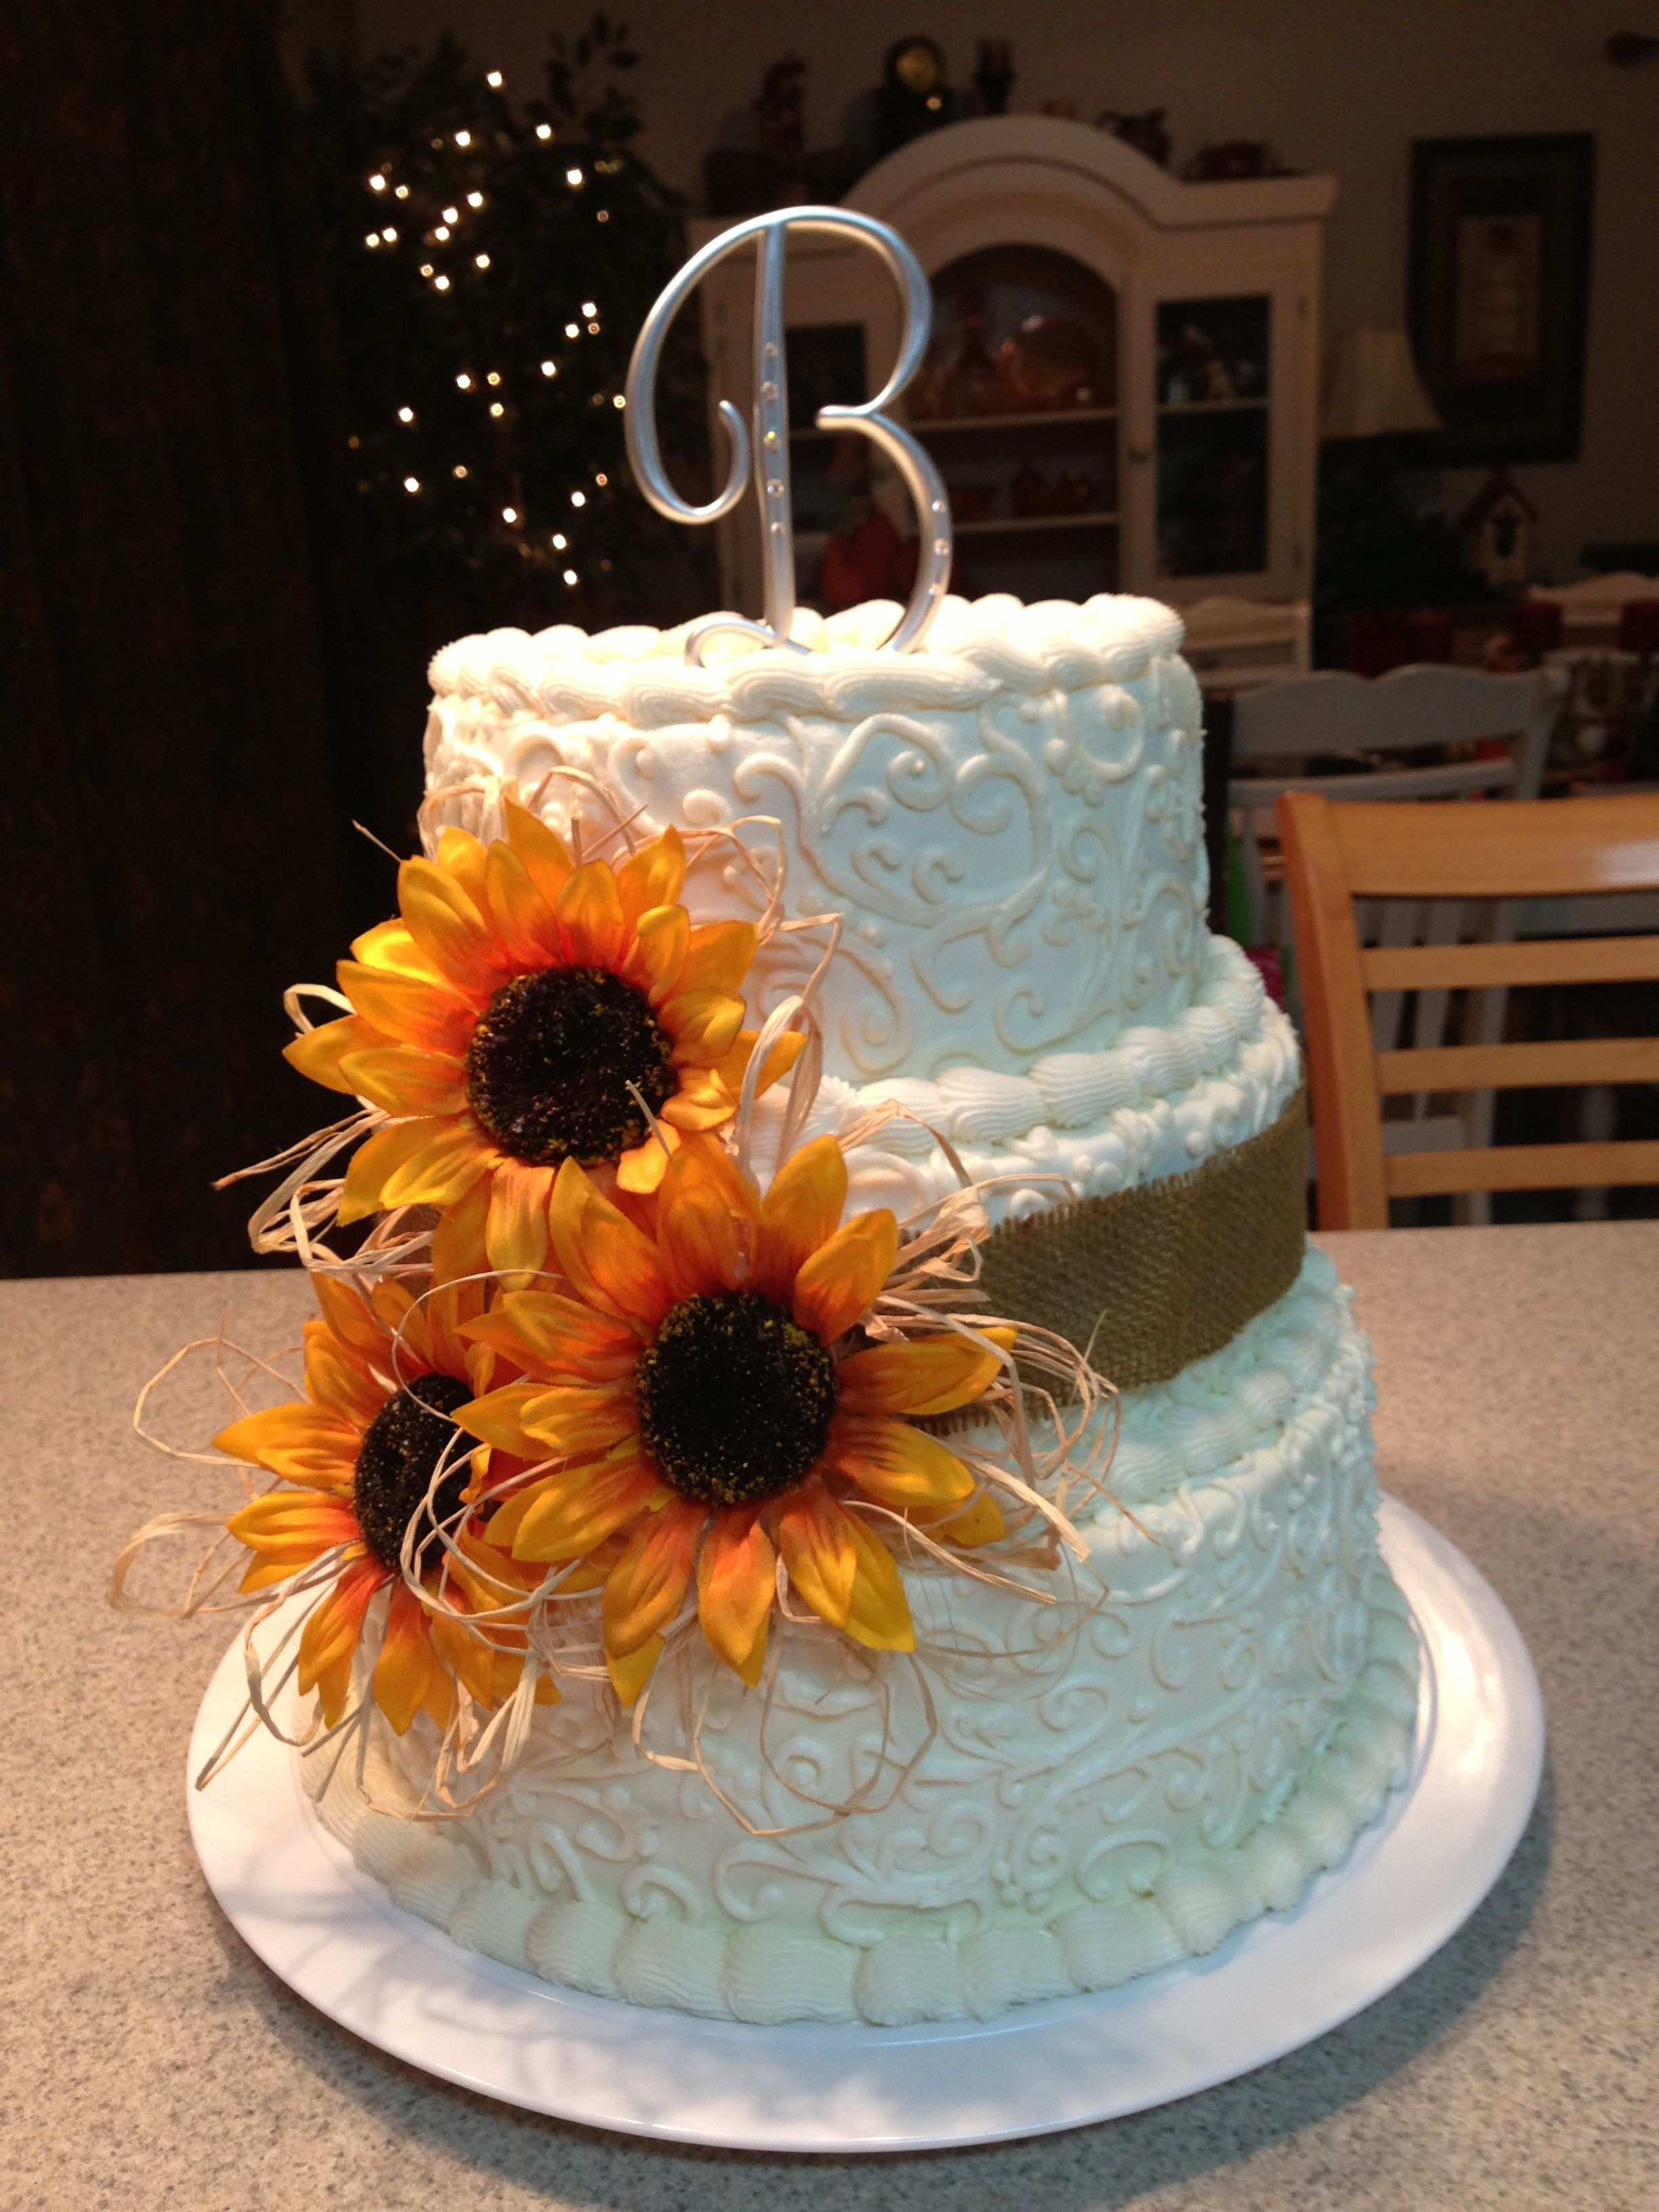 Sunflower wedding cake with burlap ribbon Country